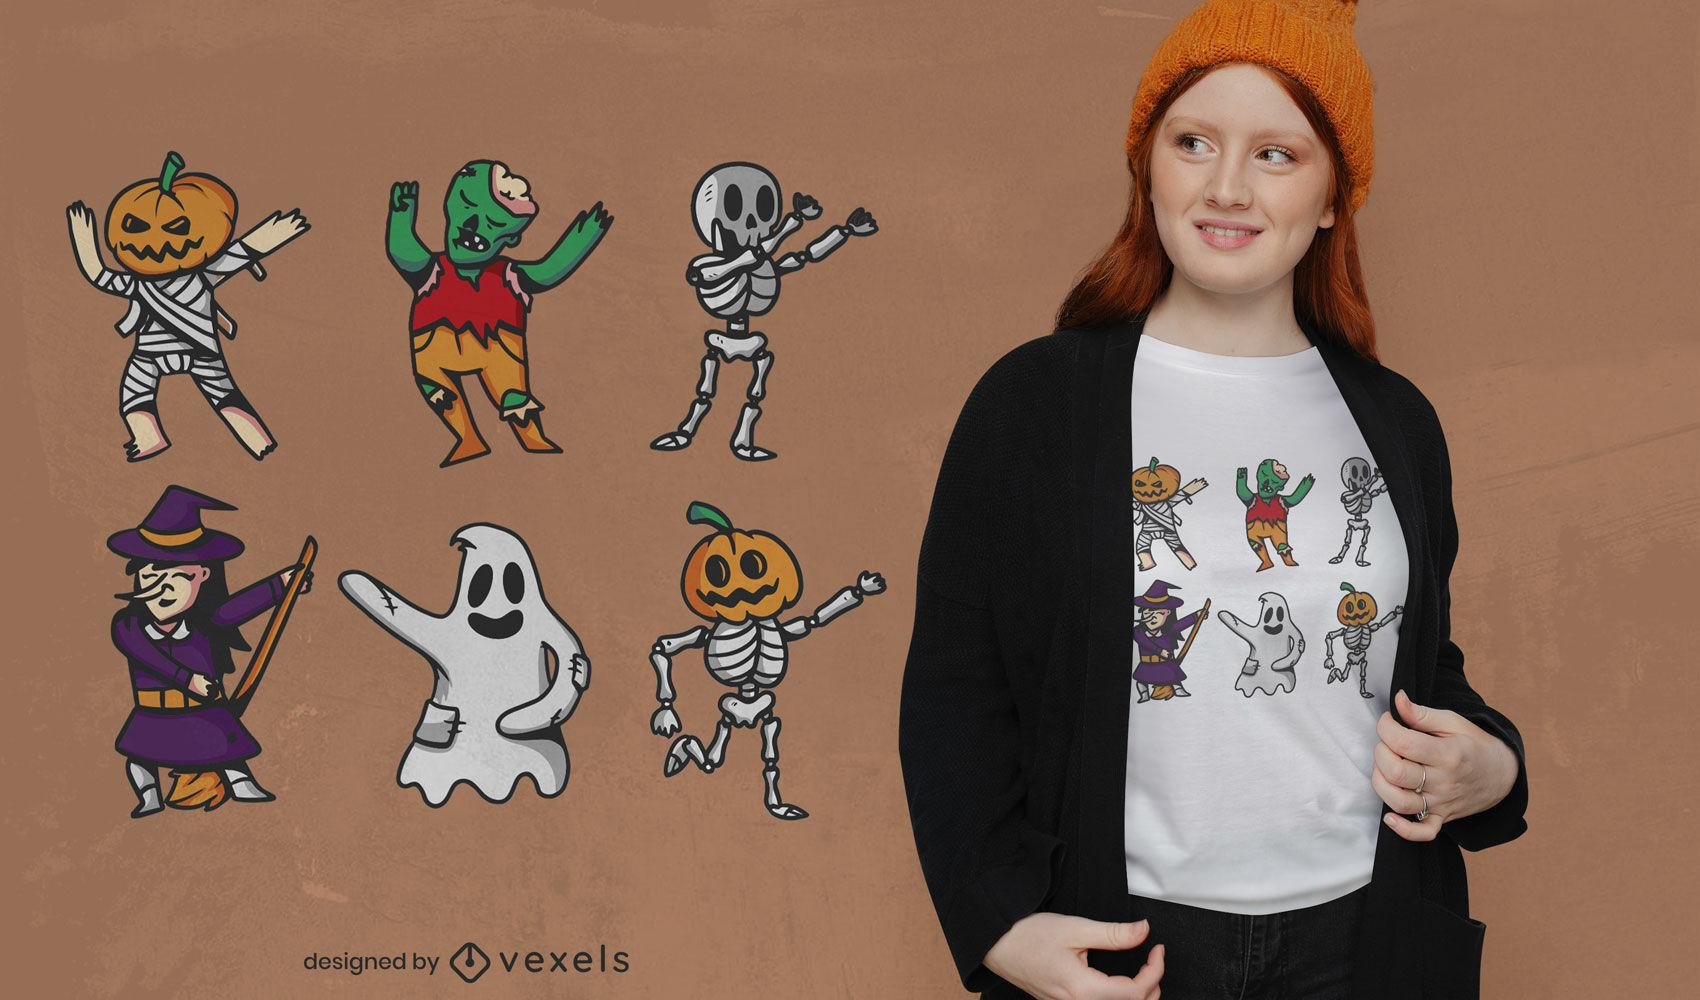 SOLICITAR Dise?o de camiseta de baile de personajes de Halloween